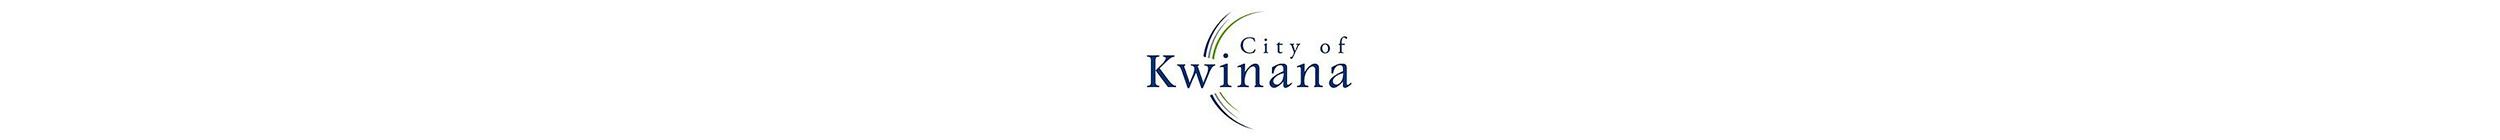 City of Kwinana Long.png